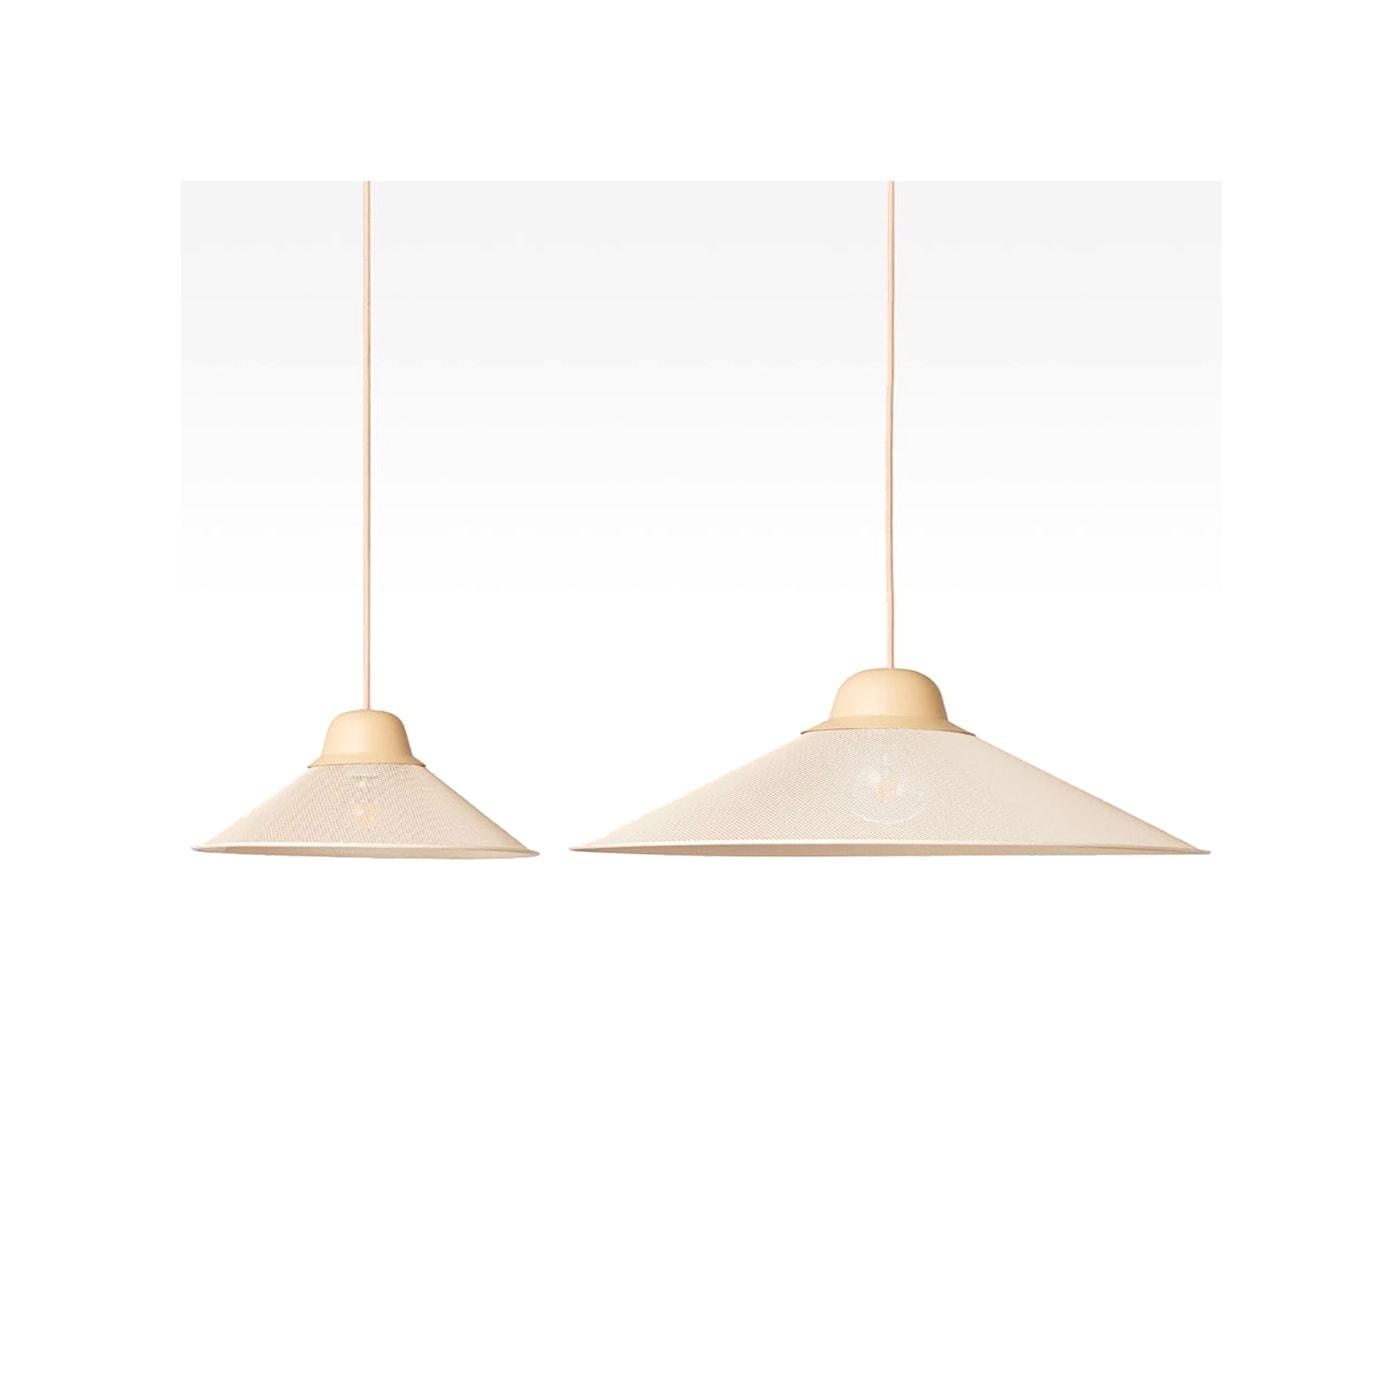 Petite Friture Aura lampada sospensione - vendita online